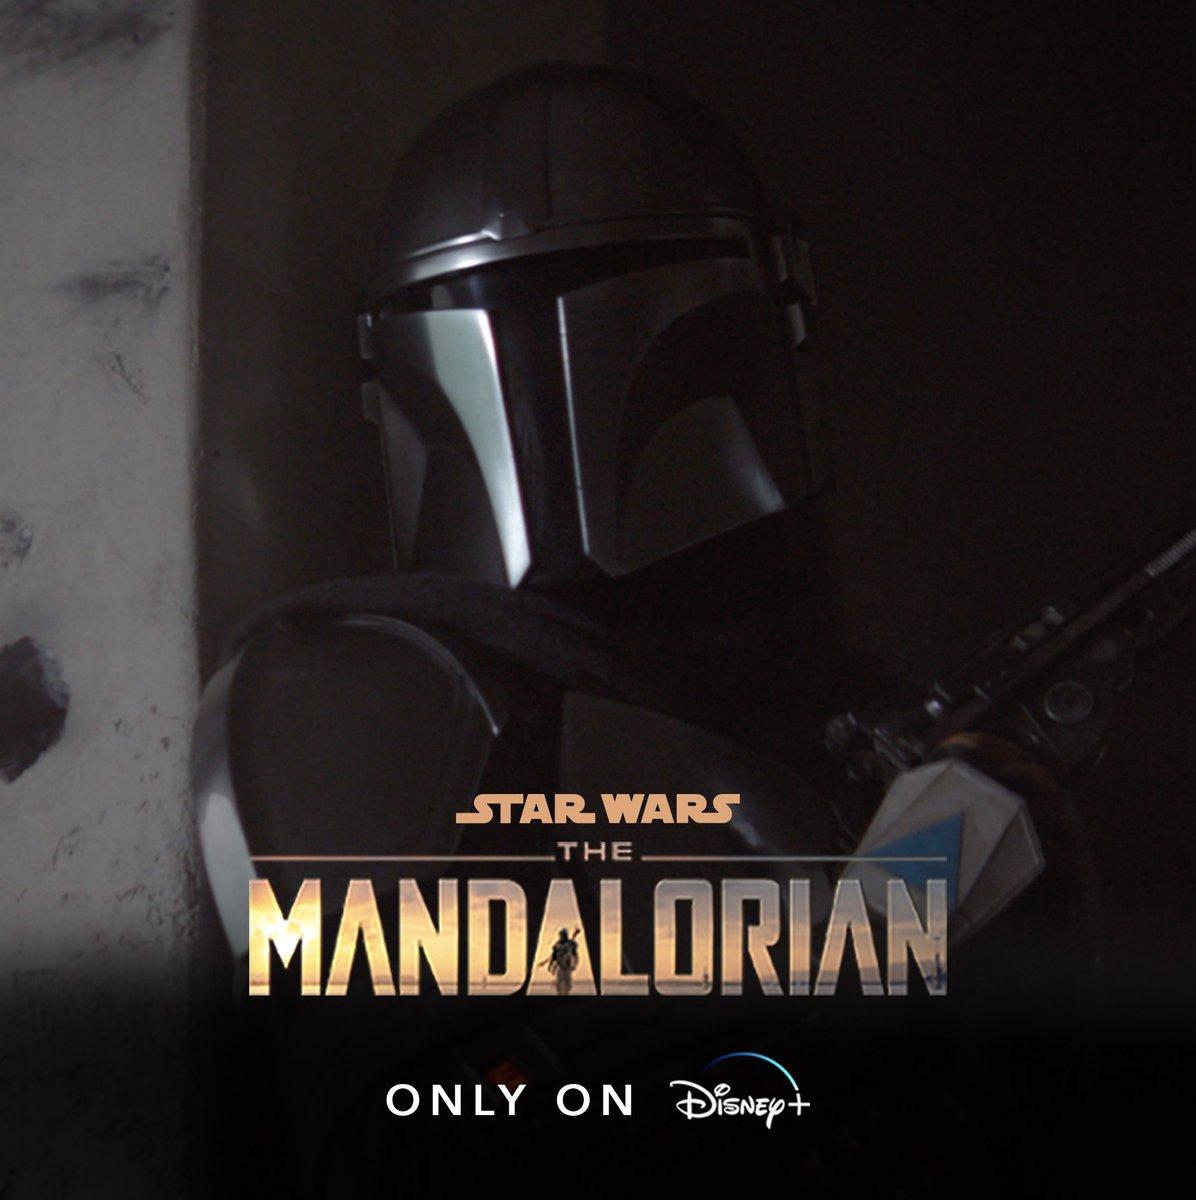 Chapter 8. Now streaming. #TheMandalorian #DisneyPlus